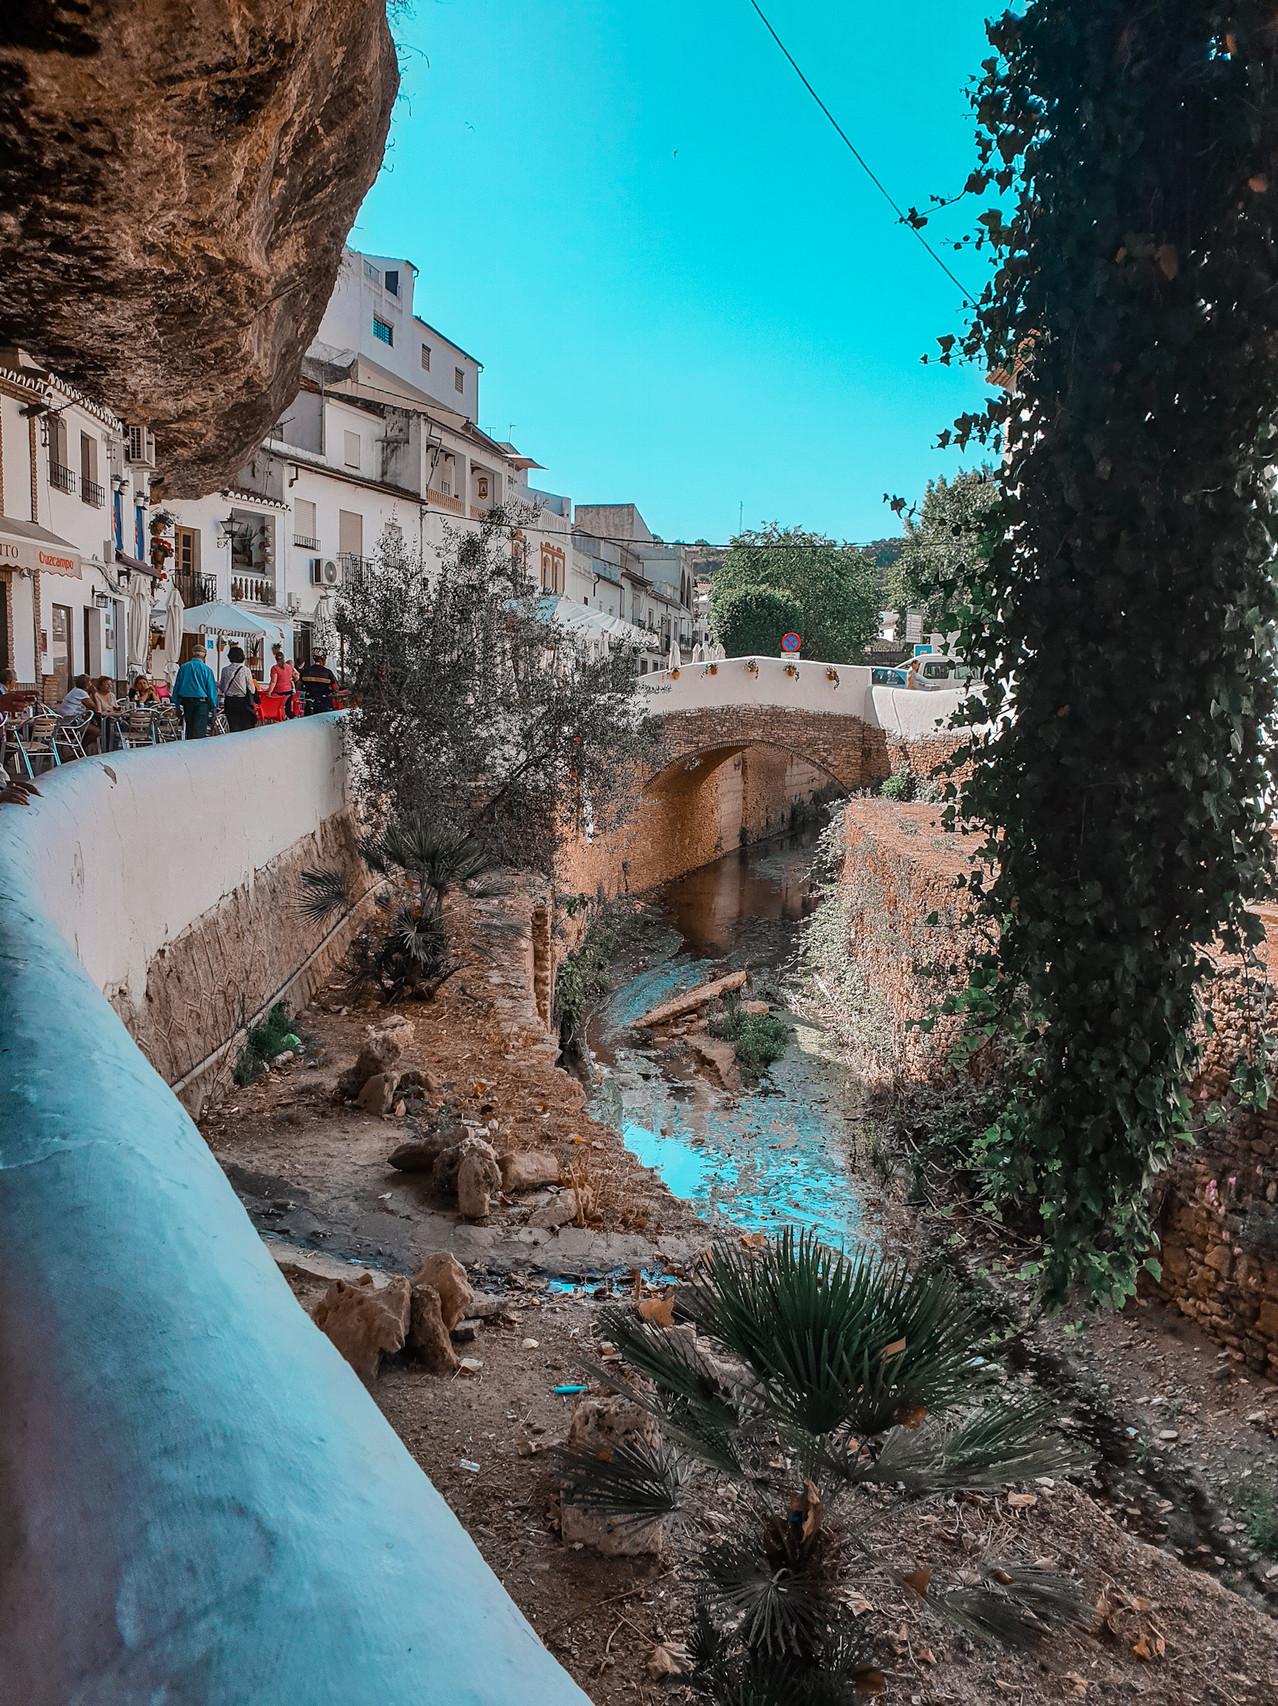 Setenil de las Bodegas - Malaga - Andalusien- Olivia Libi